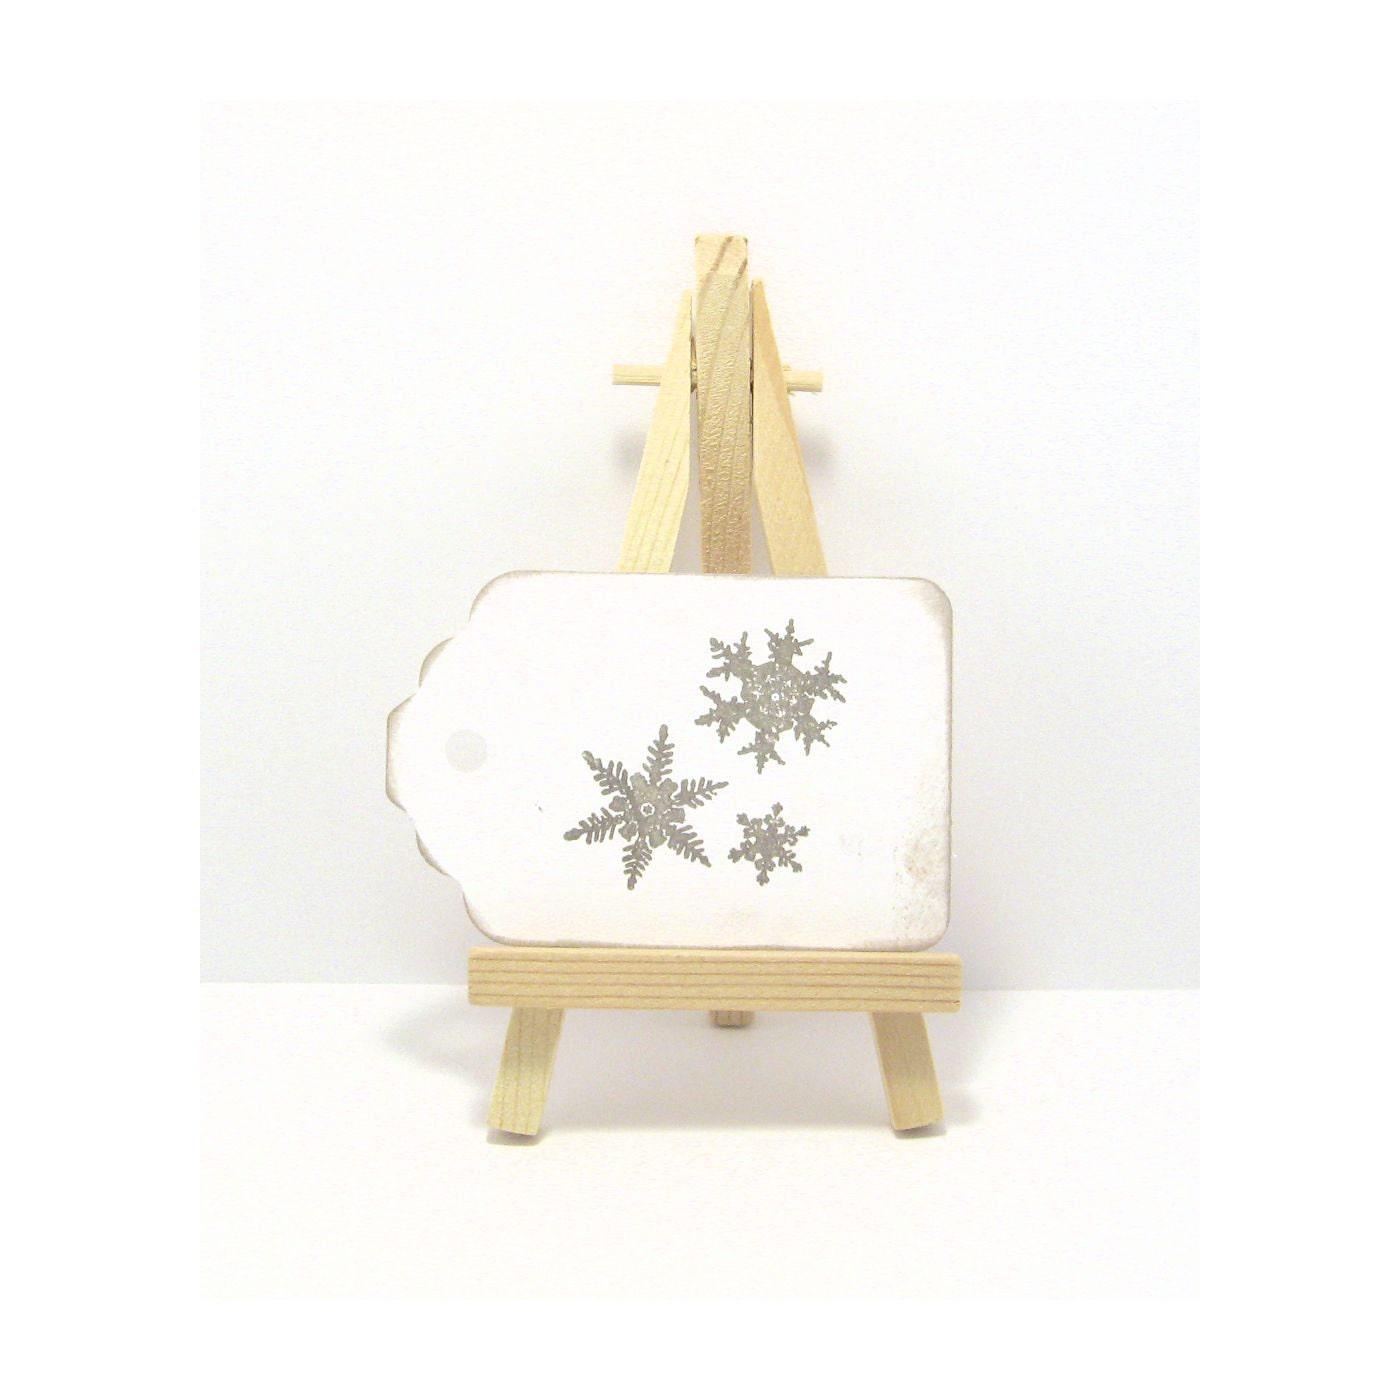 25 Snowflake Tags - Vintage Inspired Christmas Tags -  Holiday Gift Tags - Christmas Gift Tags - Distressed Tags - Snowflake Tags - PetuniasWhimsy